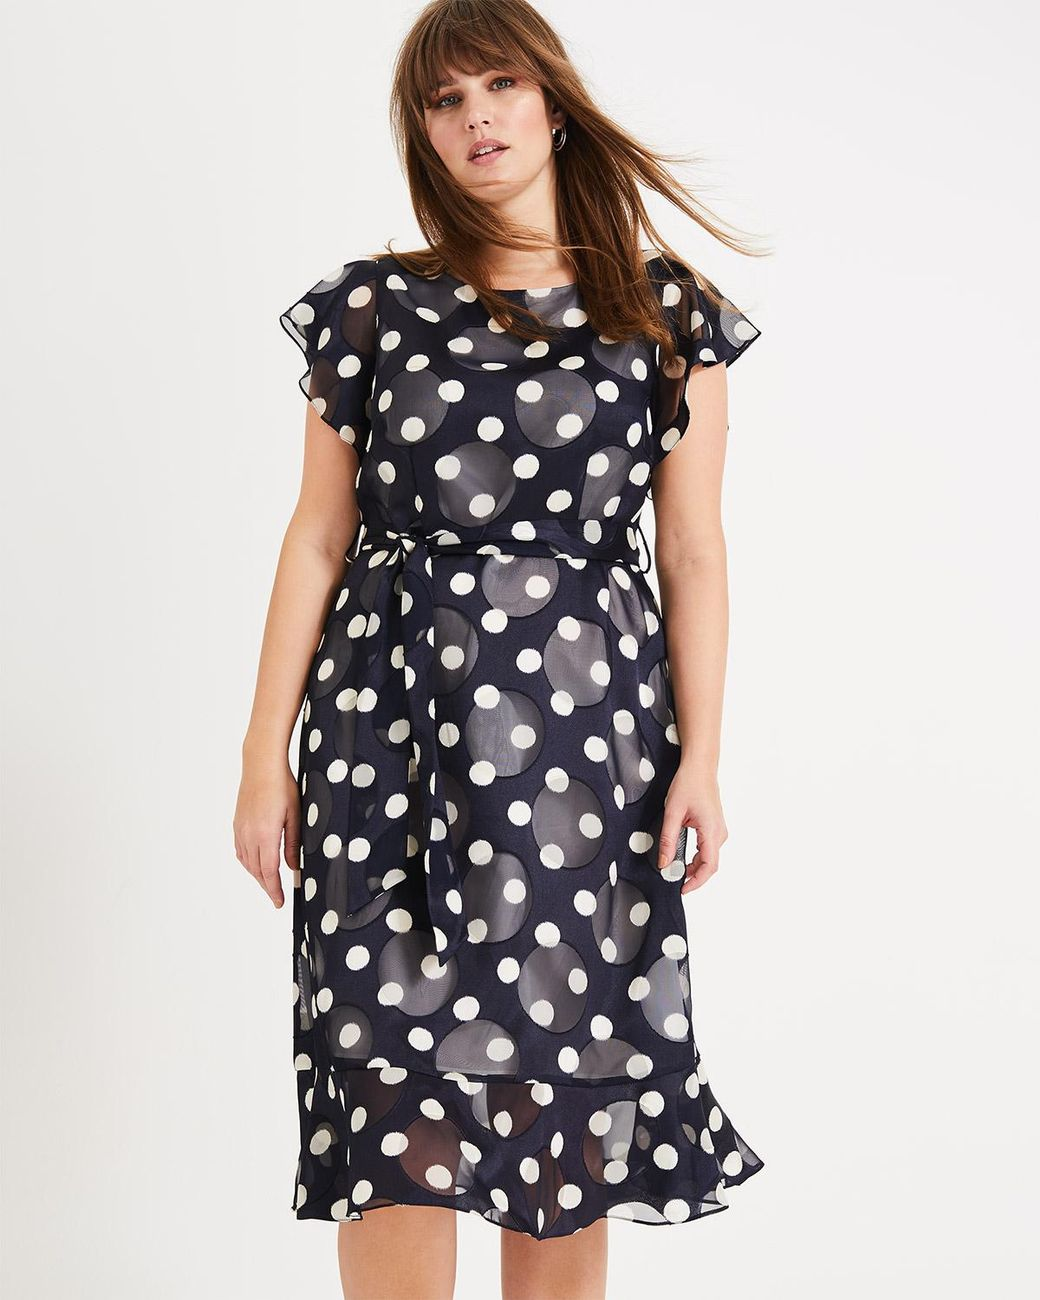 1dda2ad2498 Studio 8 Viviana Spot Dress in Blue - Lyst